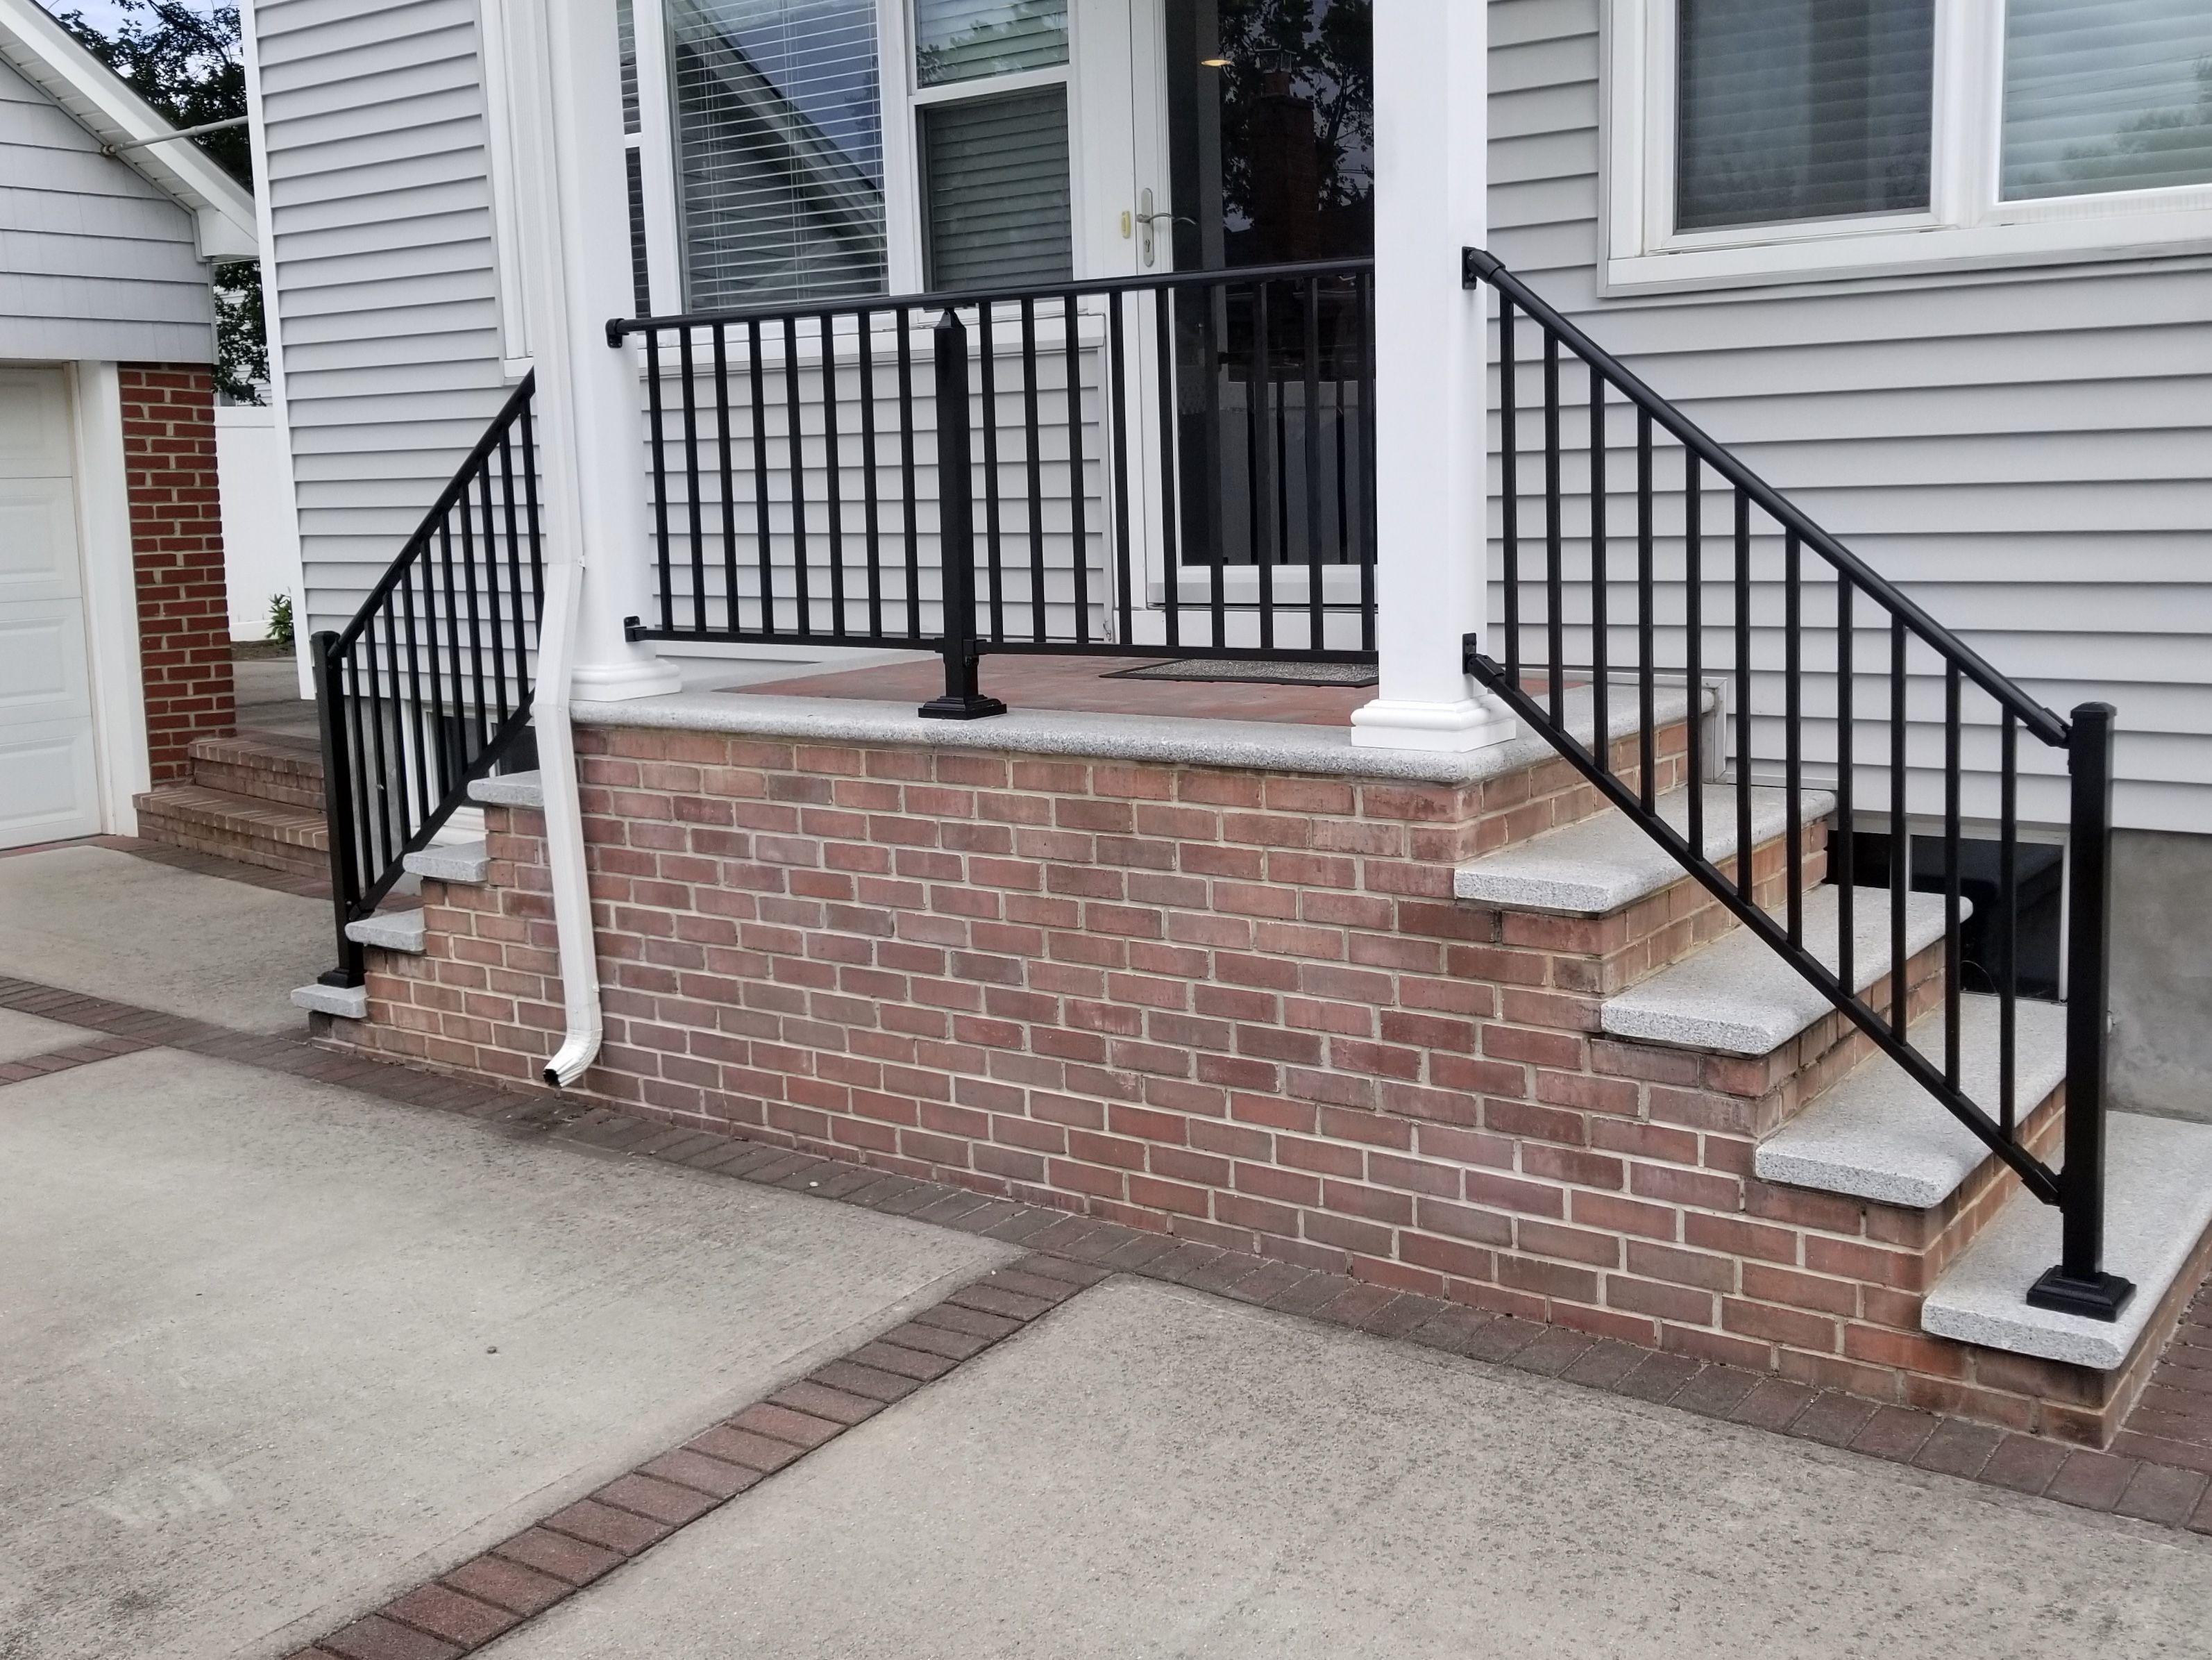 Aluminum Handrails On Concrete Steps Aluminum Fence Concrete | Aluminum Railings For Steps | Verandah | Glass Railing | Pipe | Indoor | Glass Panel Wooden Handrail